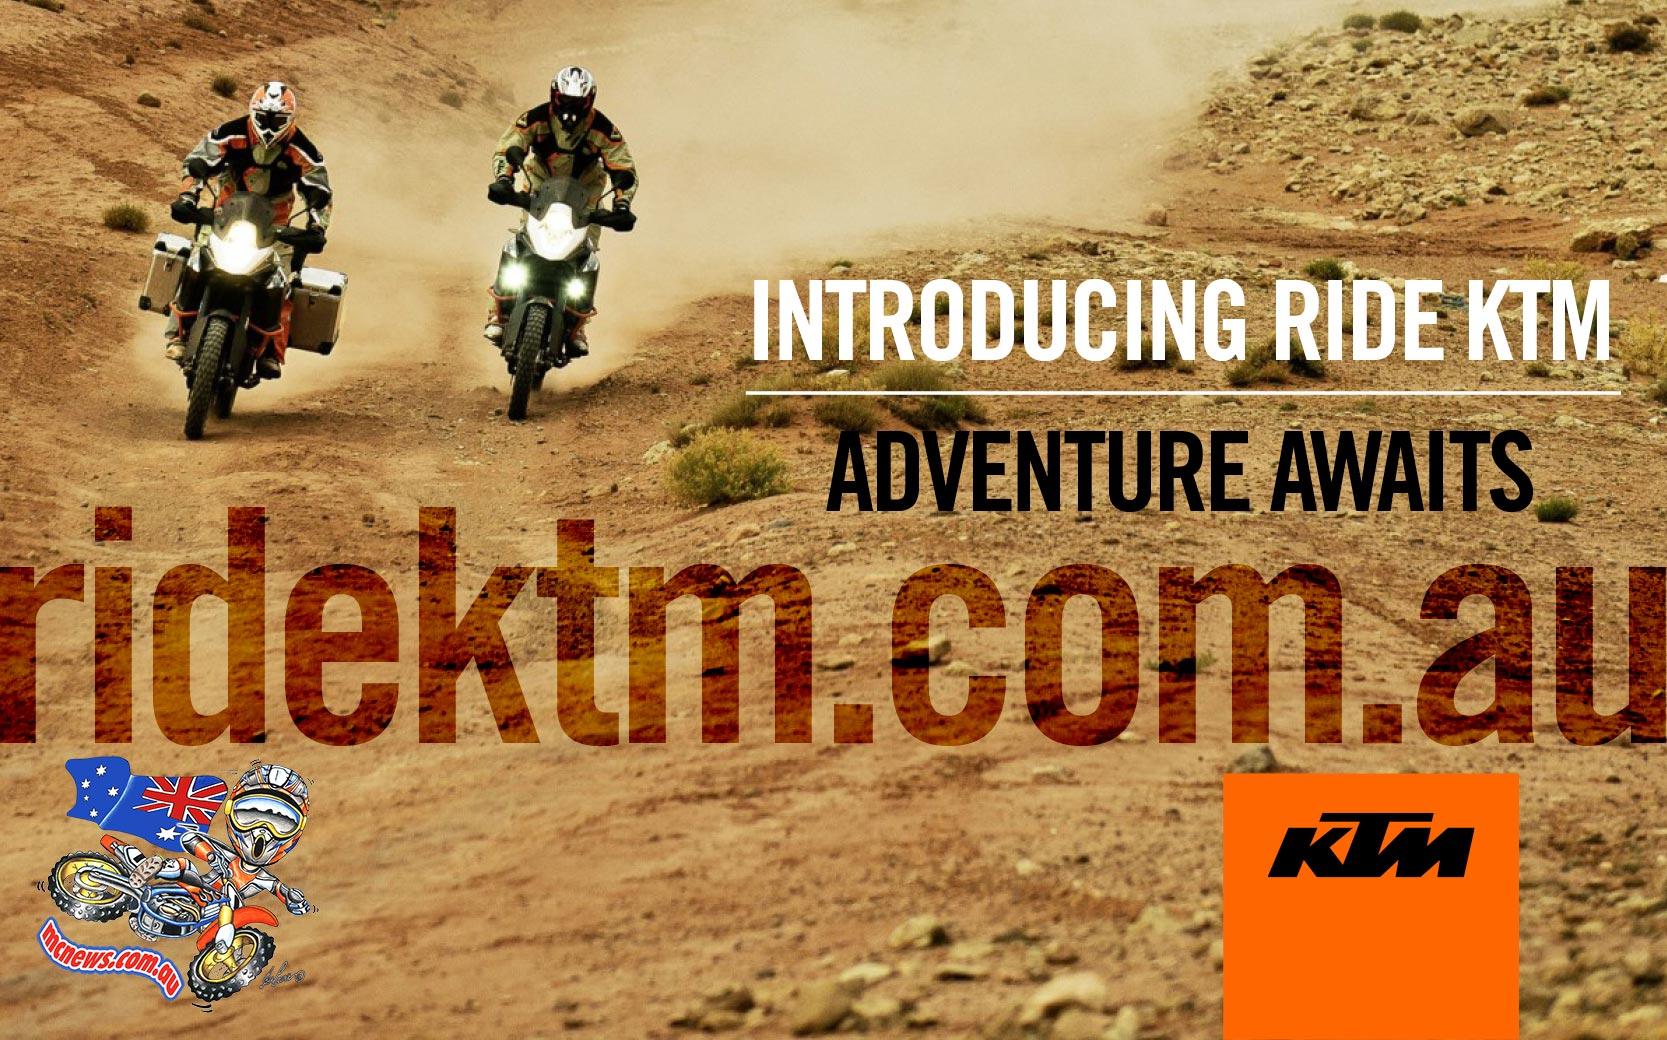 KTM Launch portal for Adventure Riders - RideKTM.com.au